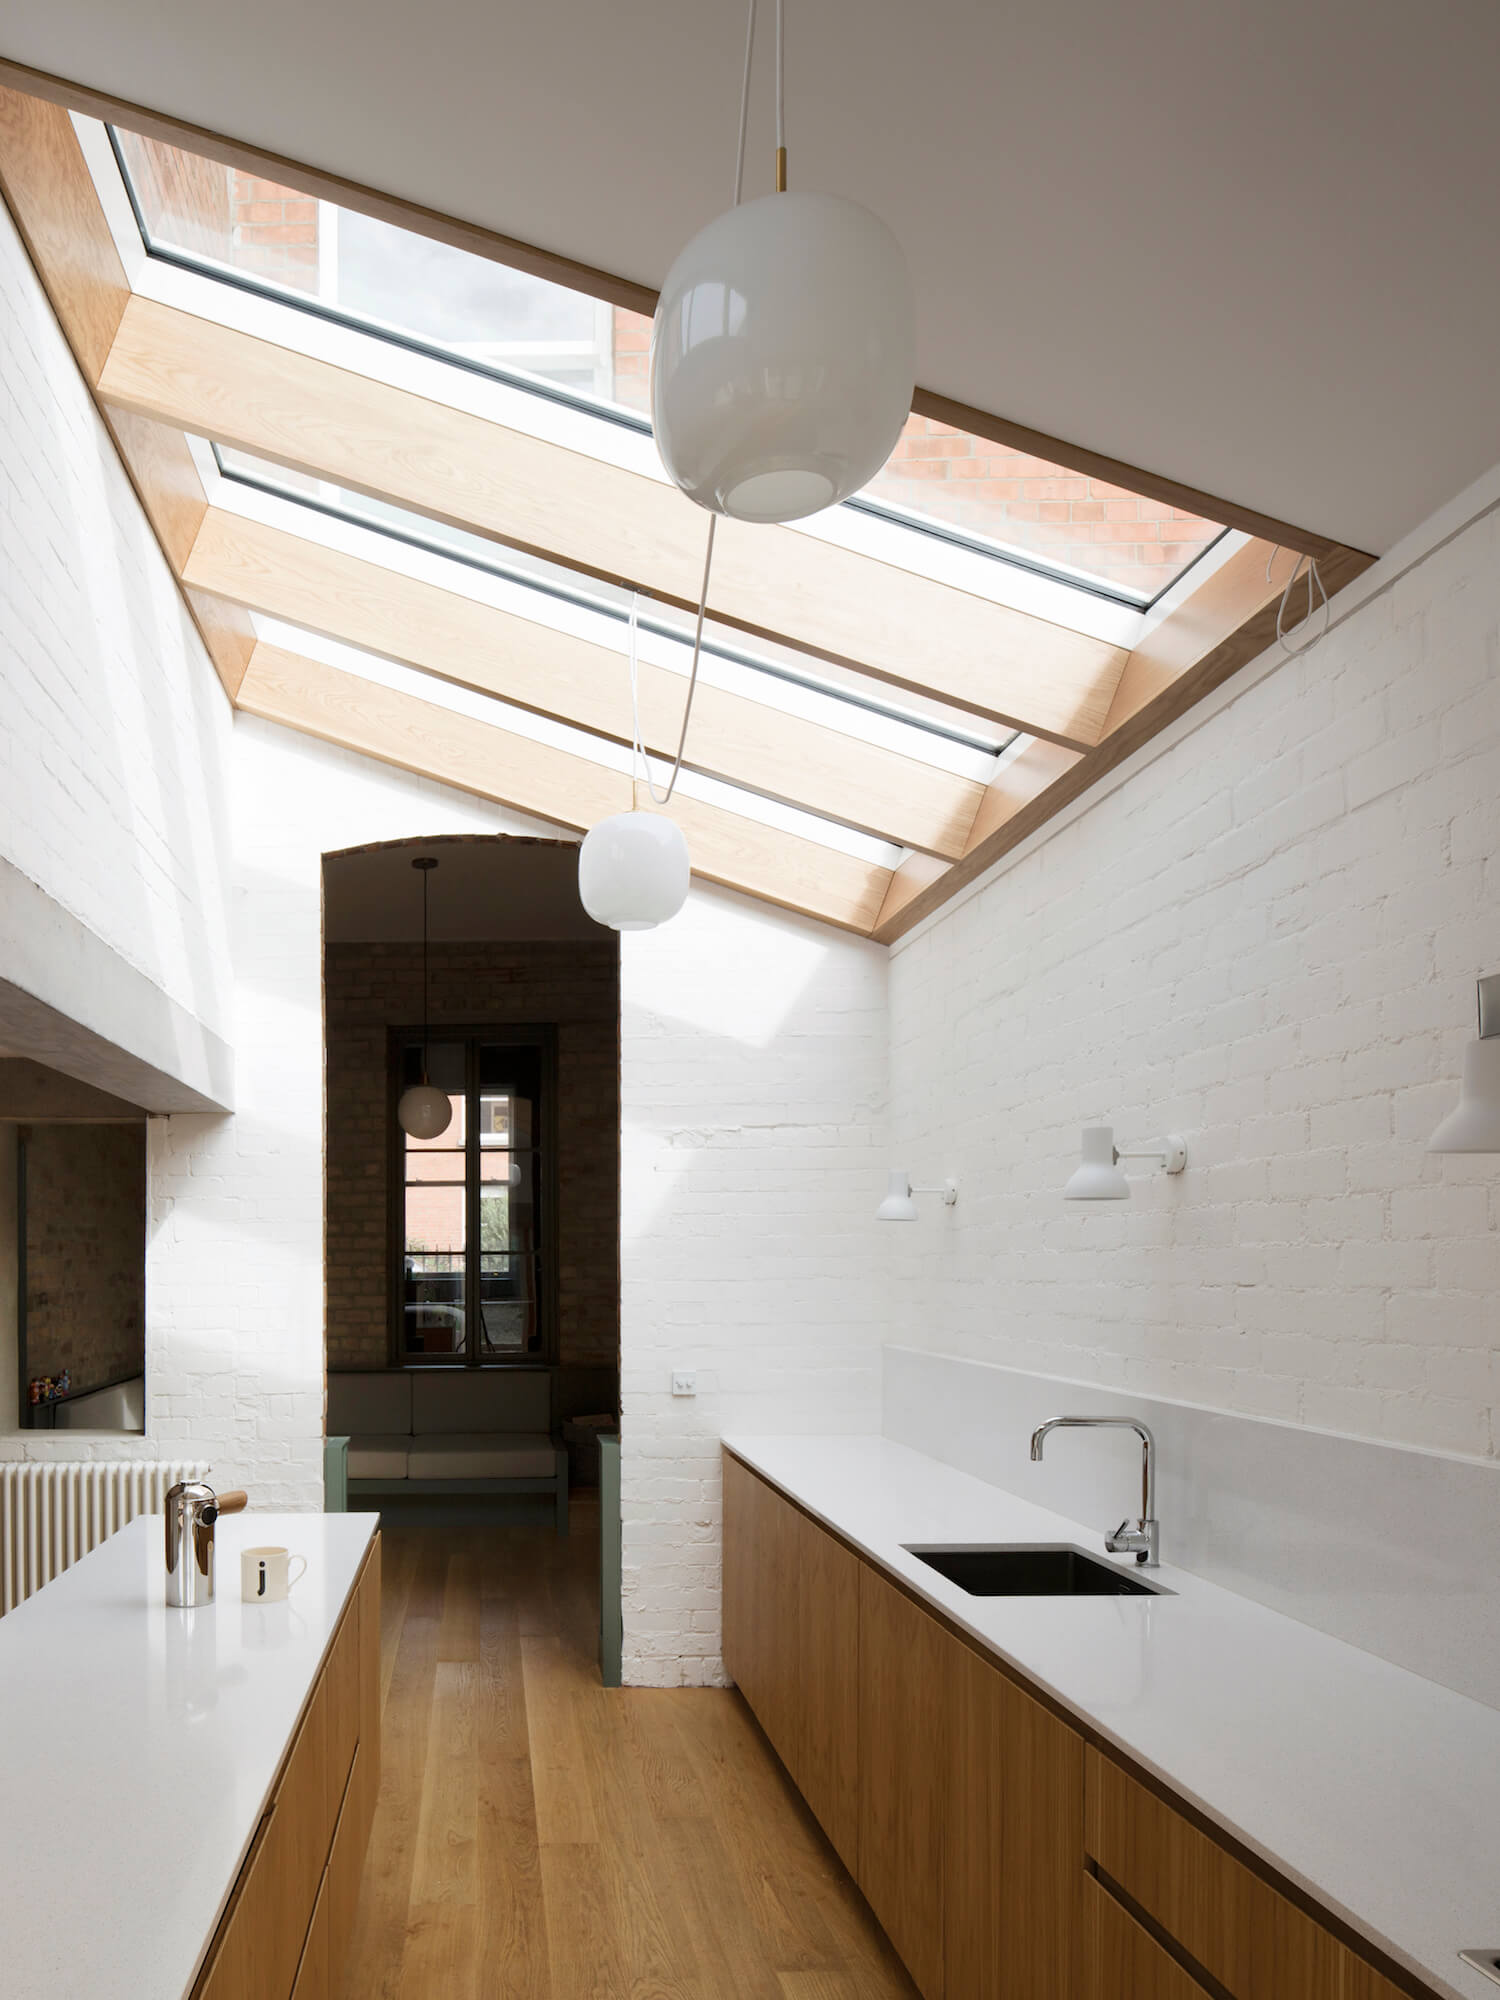 est living dublin house RWK architects 3